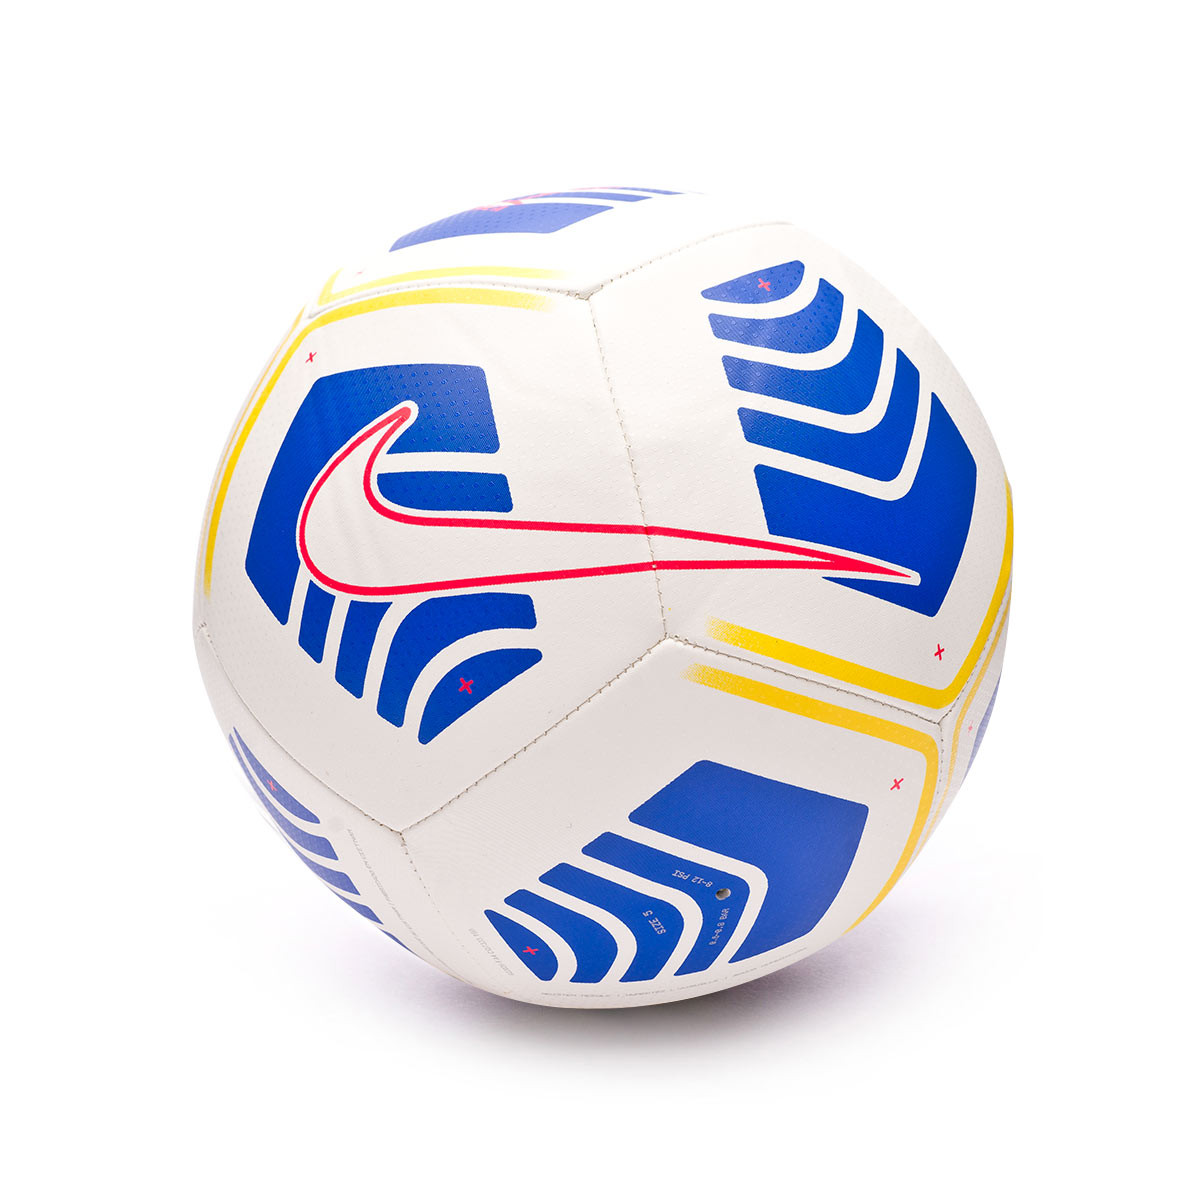 Ball Nike Serie A Pitch 2020 2021 White Racer Blue Black White Football Store Futbol Emotion